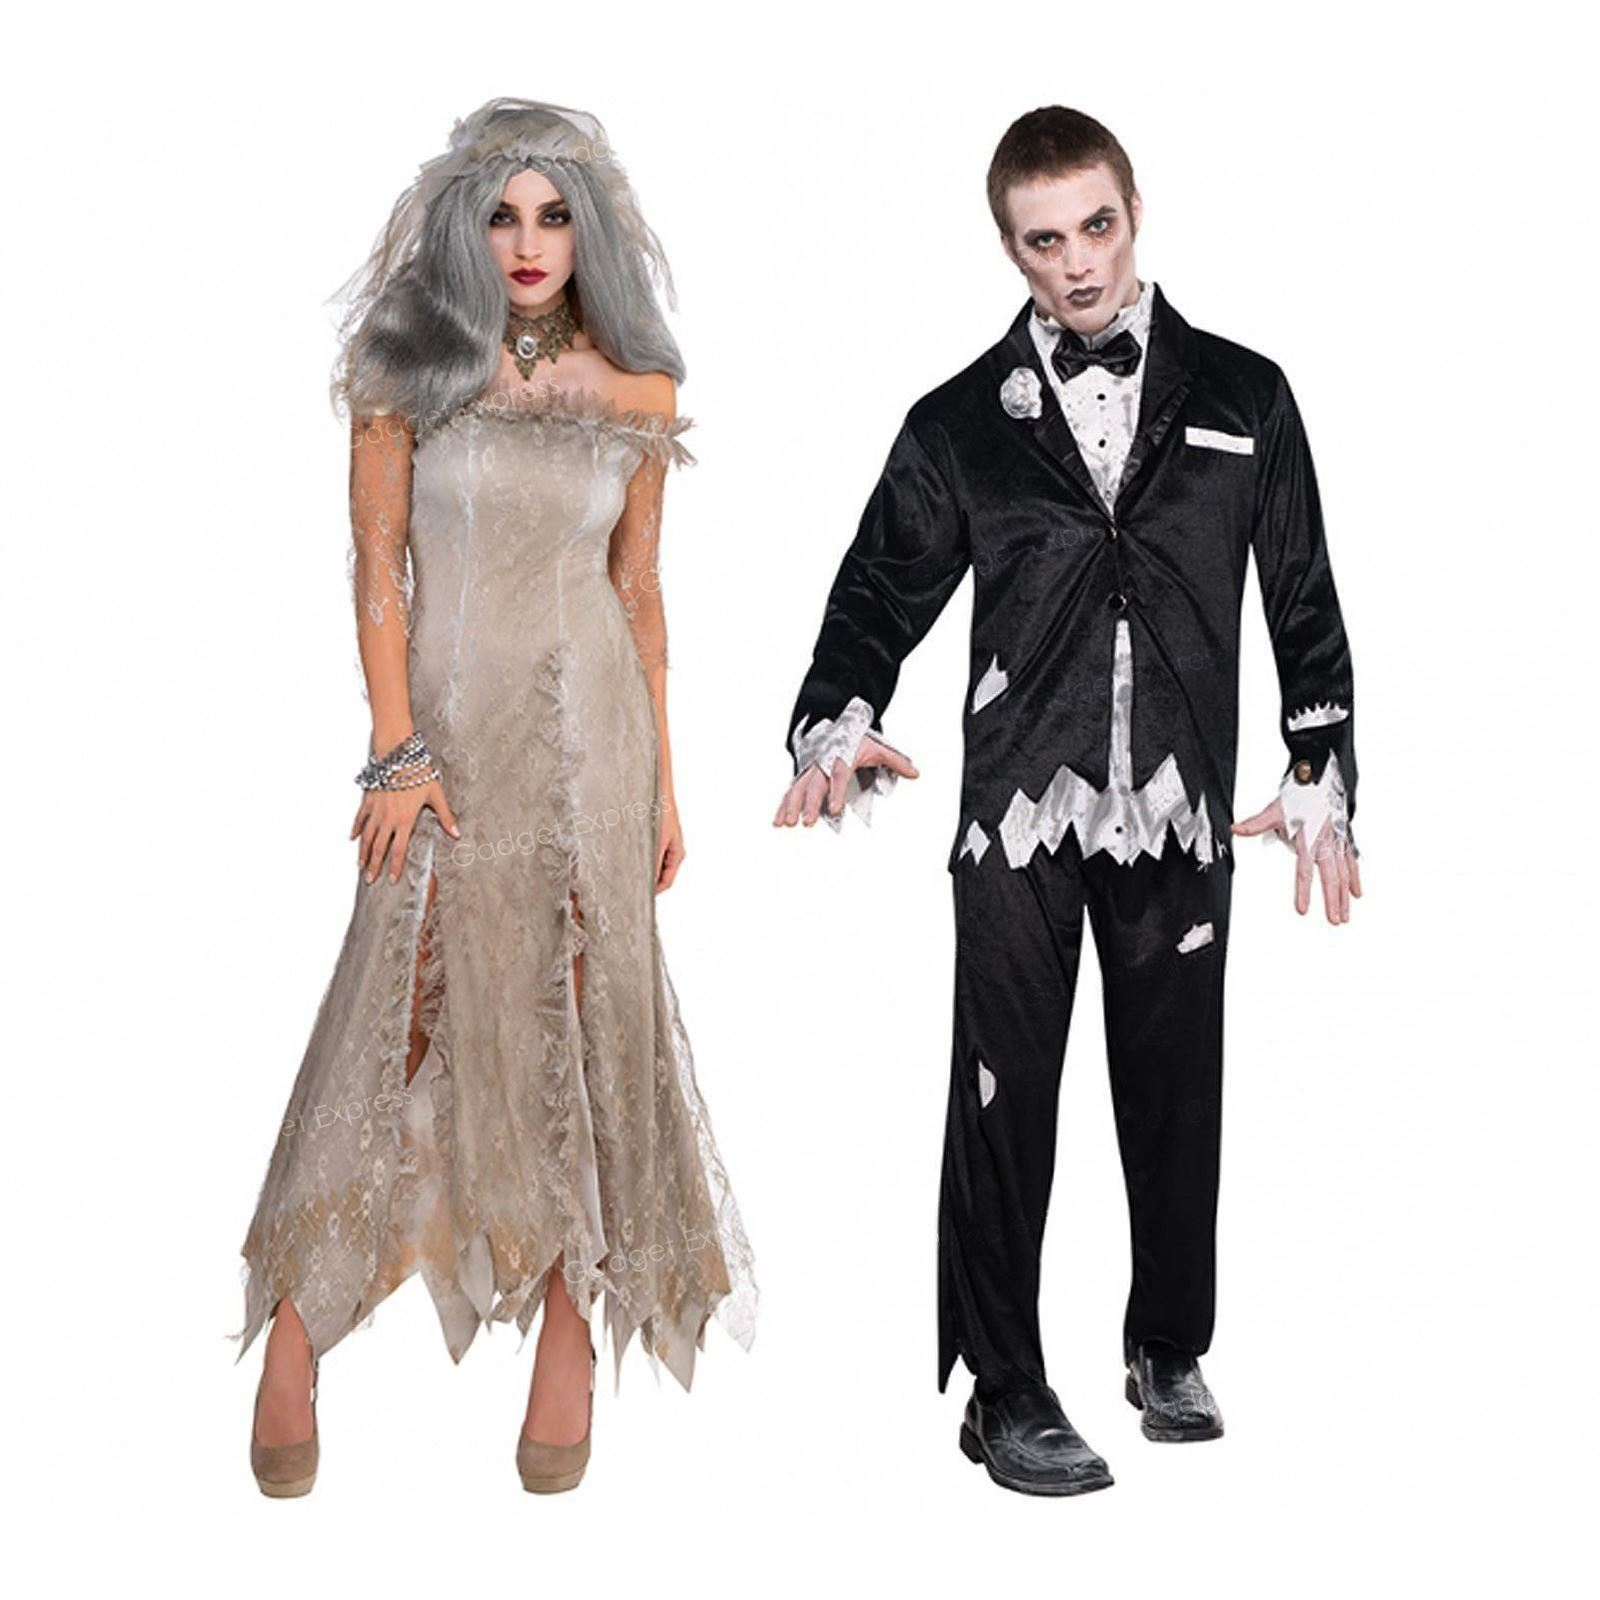 Mens Ladies Zombie Dead Bride Groom Couples Costume Adult ...